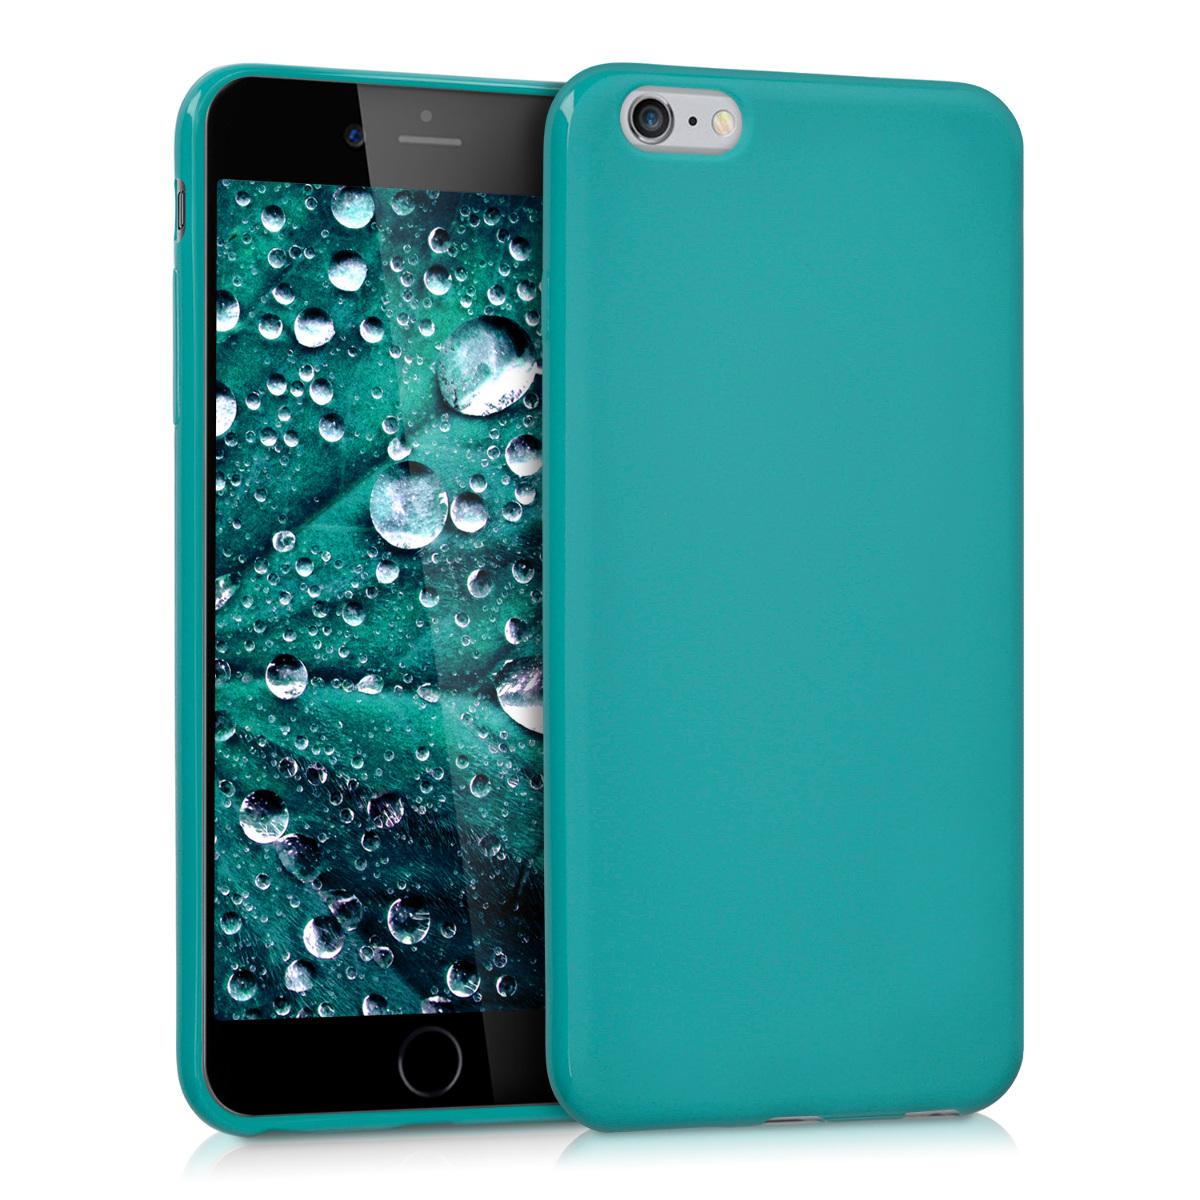 Kvalitní silikonové TPU pouzdro pro Apple iPhone 6 Plus / 6S - Teal Matte